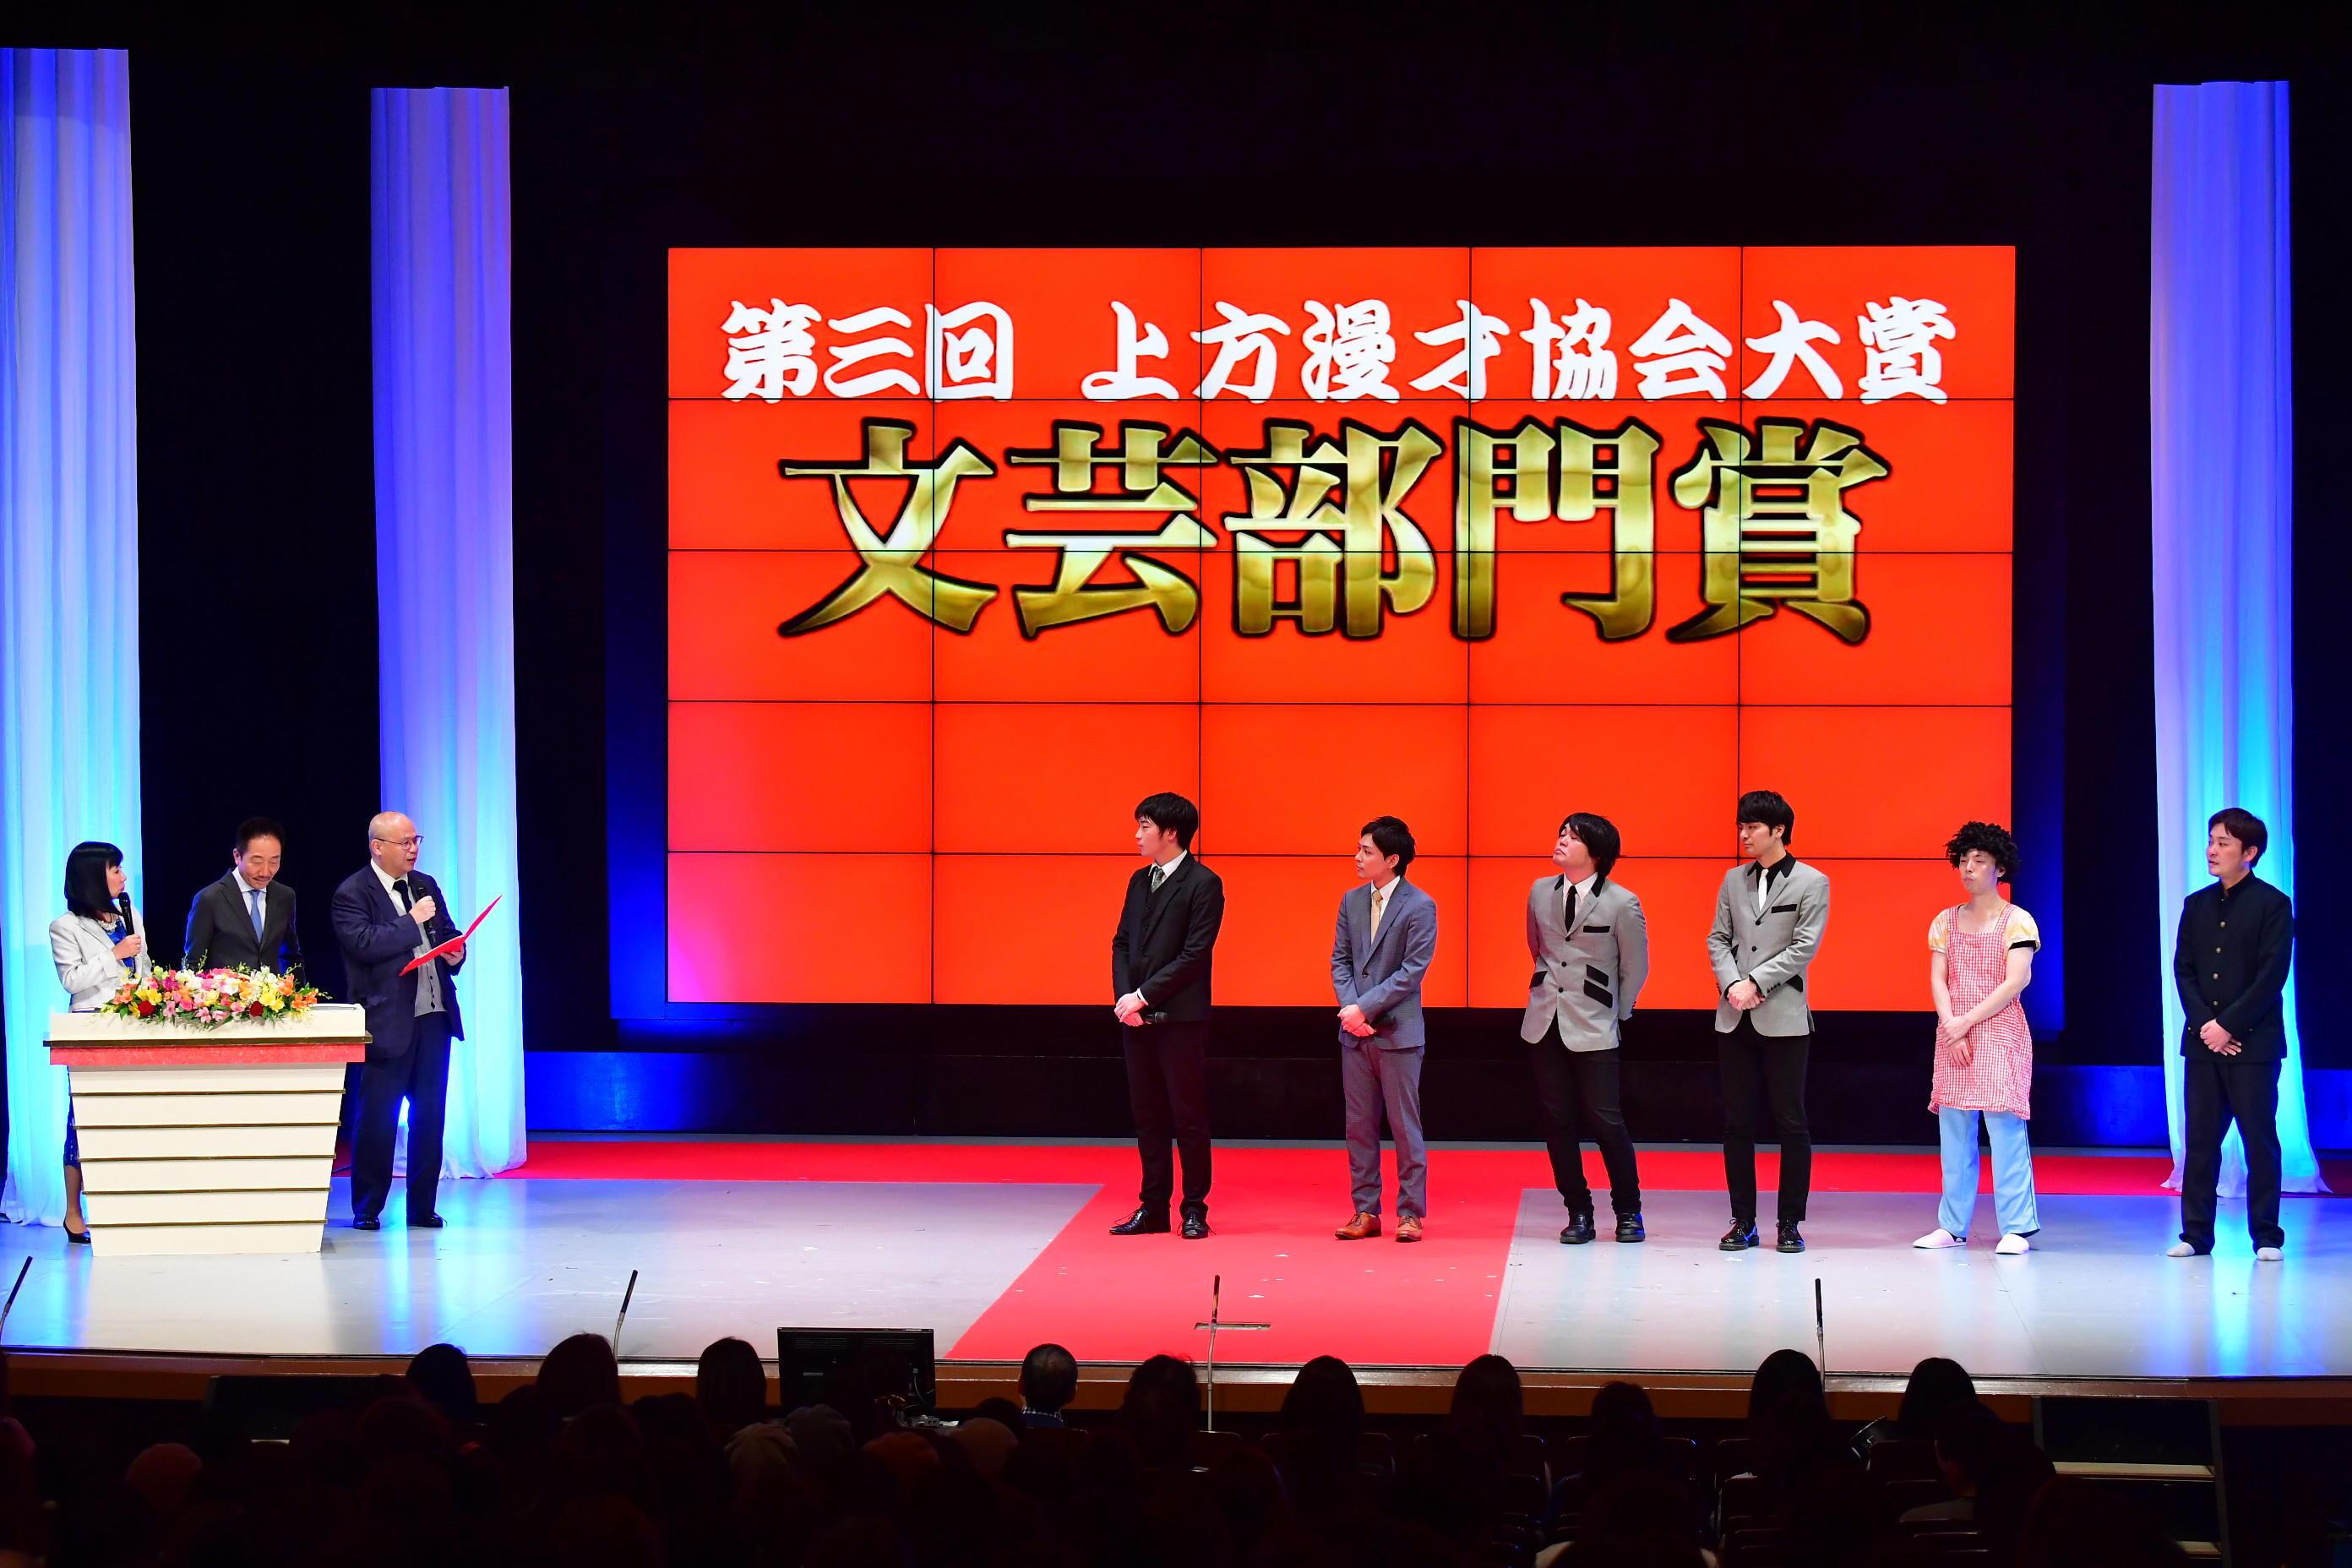 http://news.yoshimoto.co.jp/20180109015659-ea04e7ace694df02ac52e1d4a0670352c812e91b.jpg